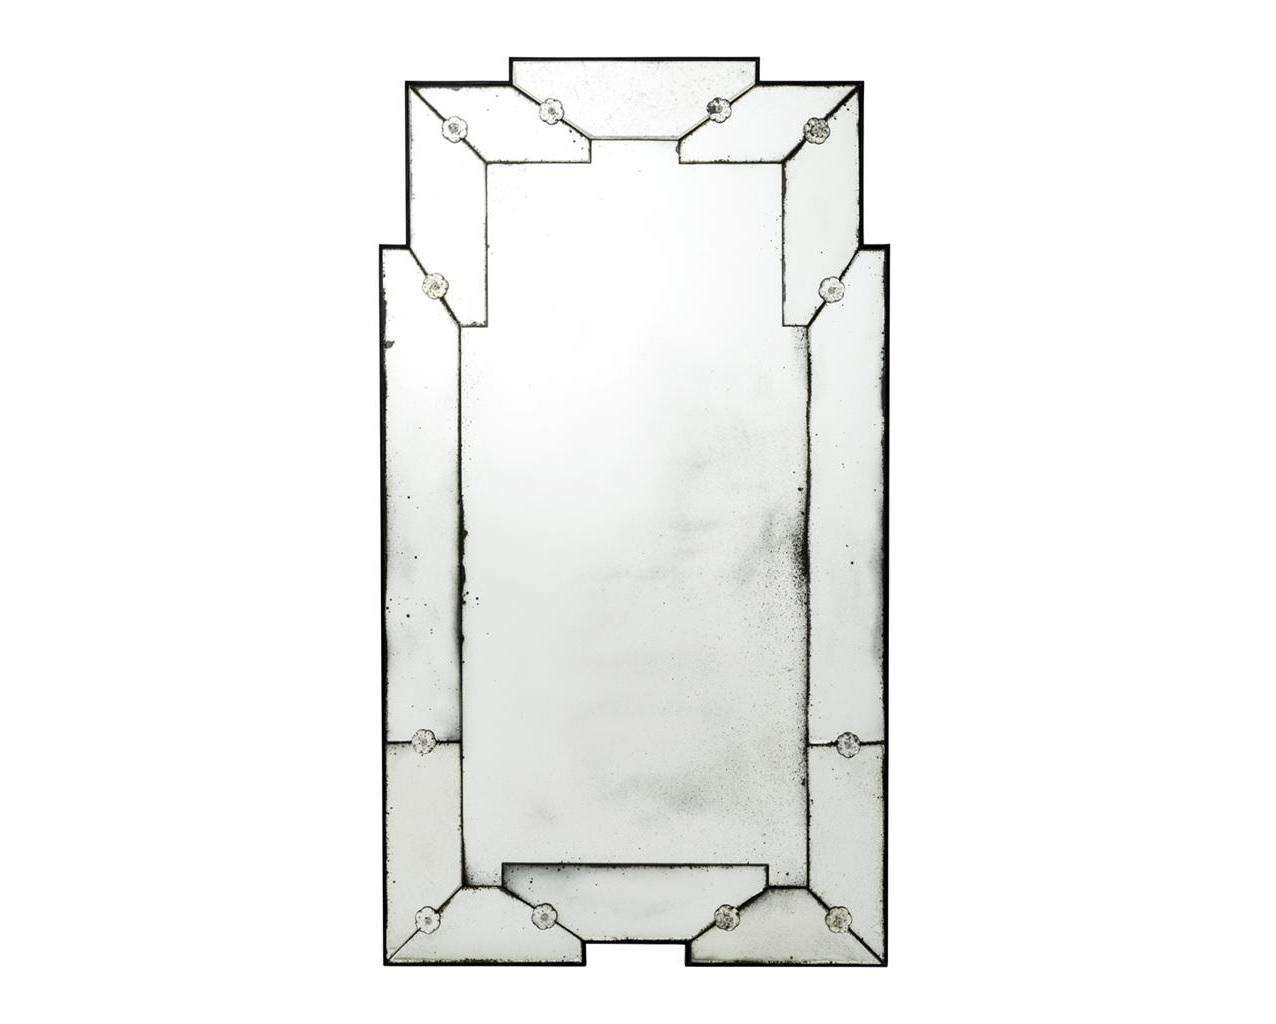 Зеркало Mirror EsteroНастенные зеркала<br><br><br>Material: Стекло<br>Ширина см: 80<br>Высота см: 140